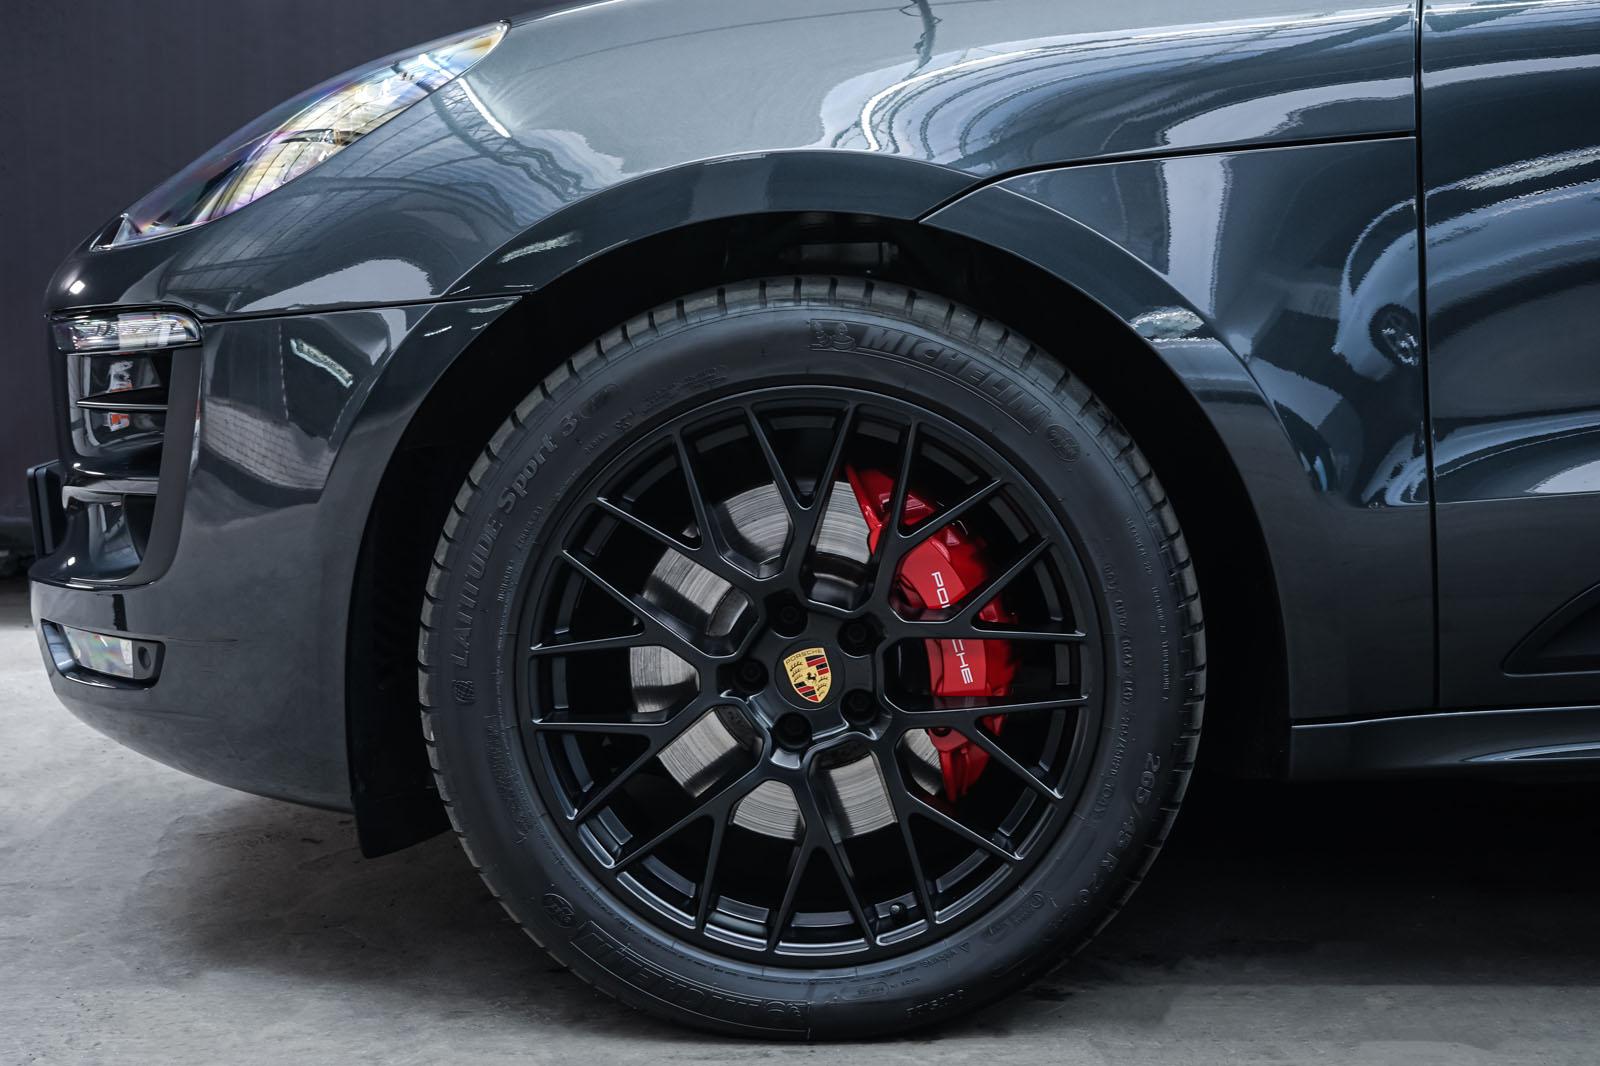 Porsche_Macan_GTS_Dunkelgrau_Schwarz_POR-8174_3_w